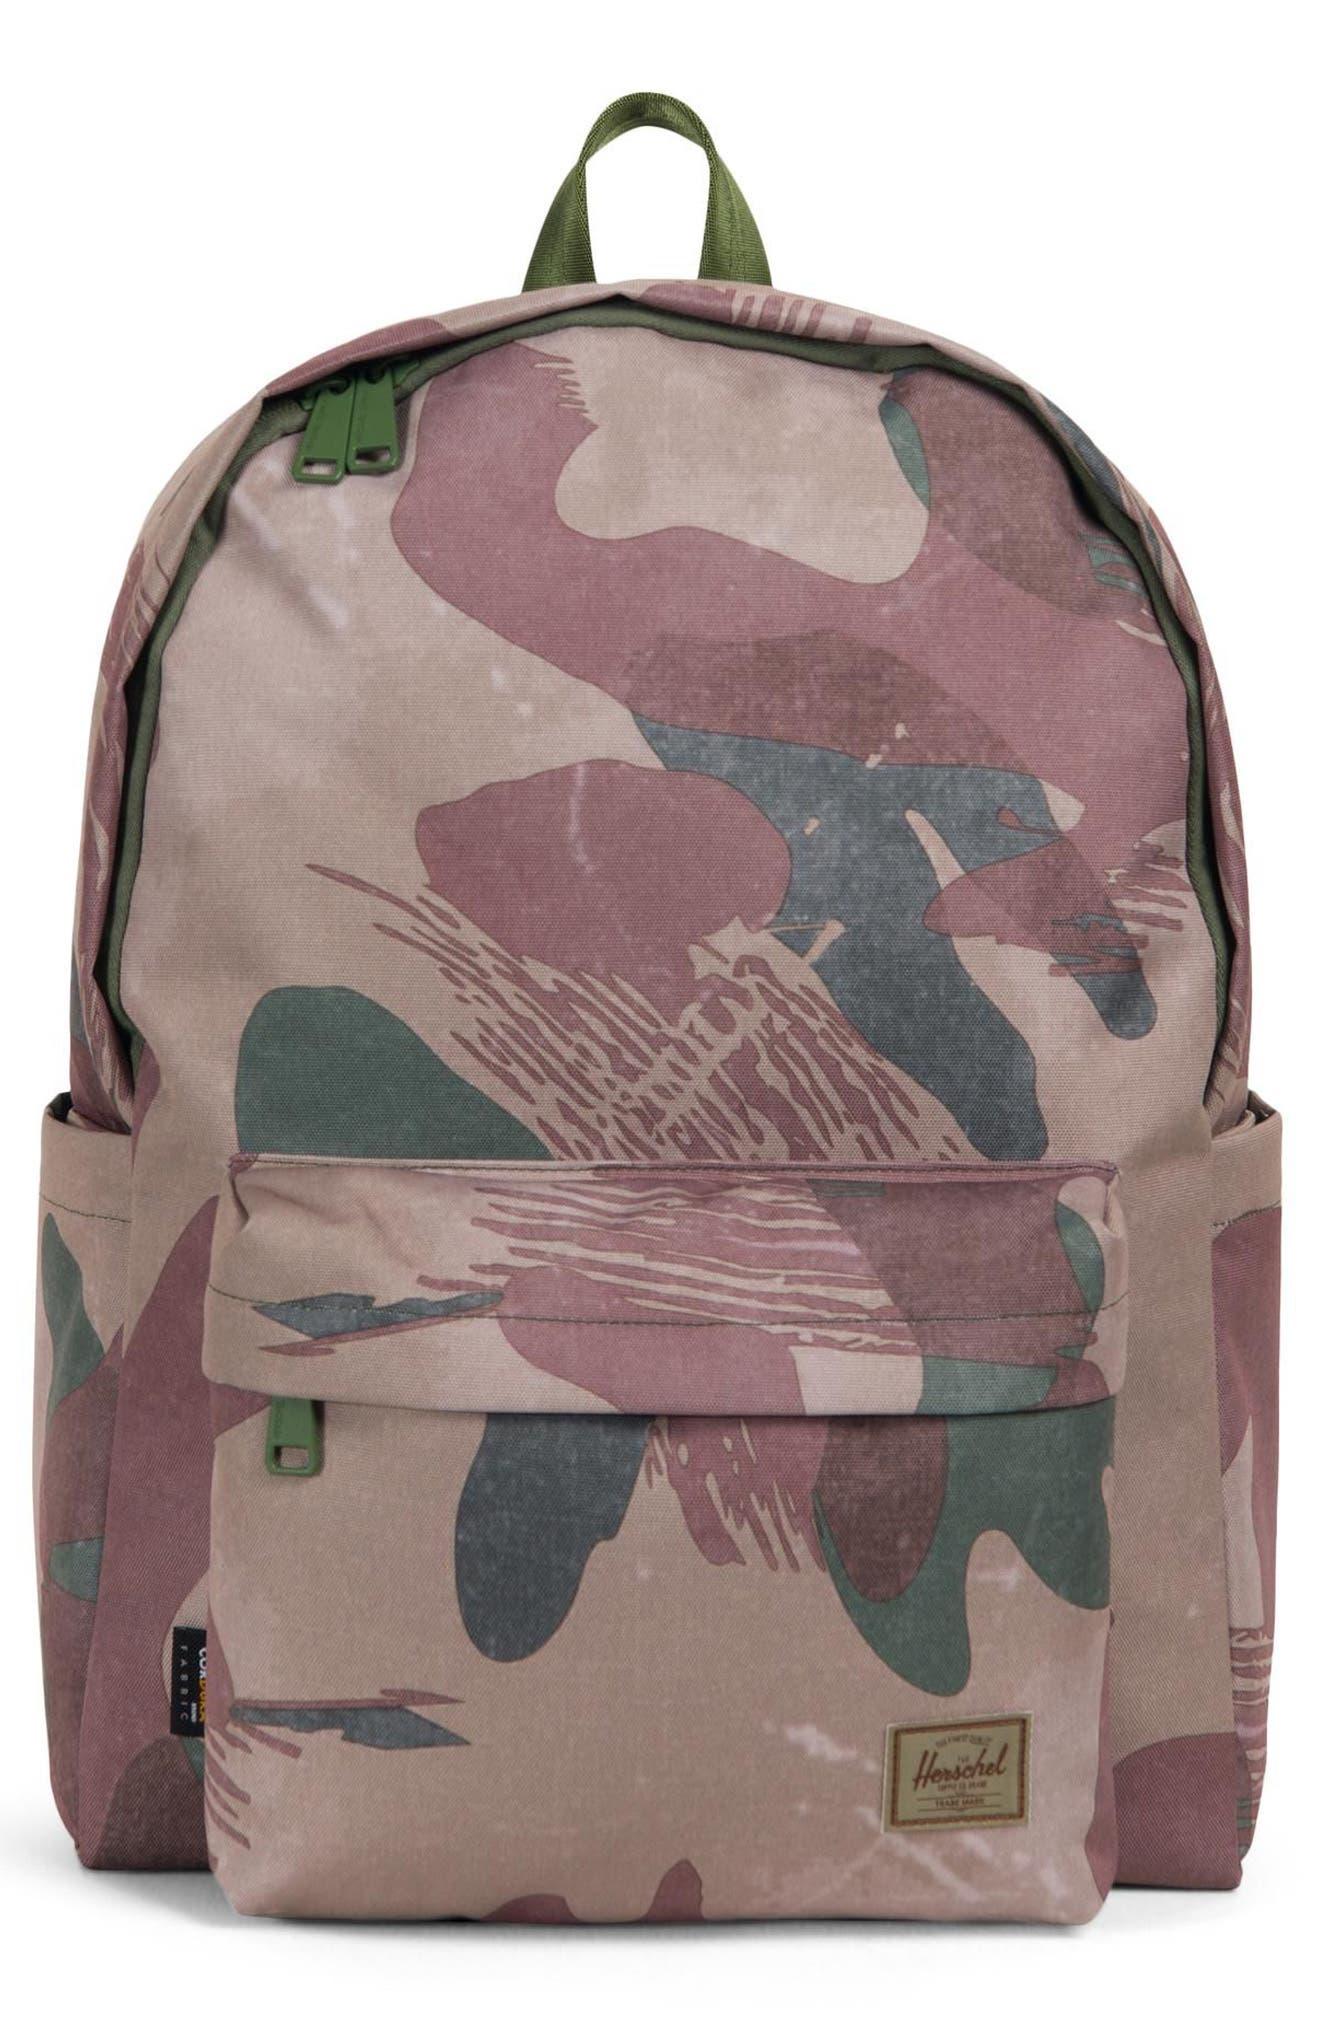 Berg Backpack,                             Main thumbnail 1, color,                             BRUSHSTROKE CAMO